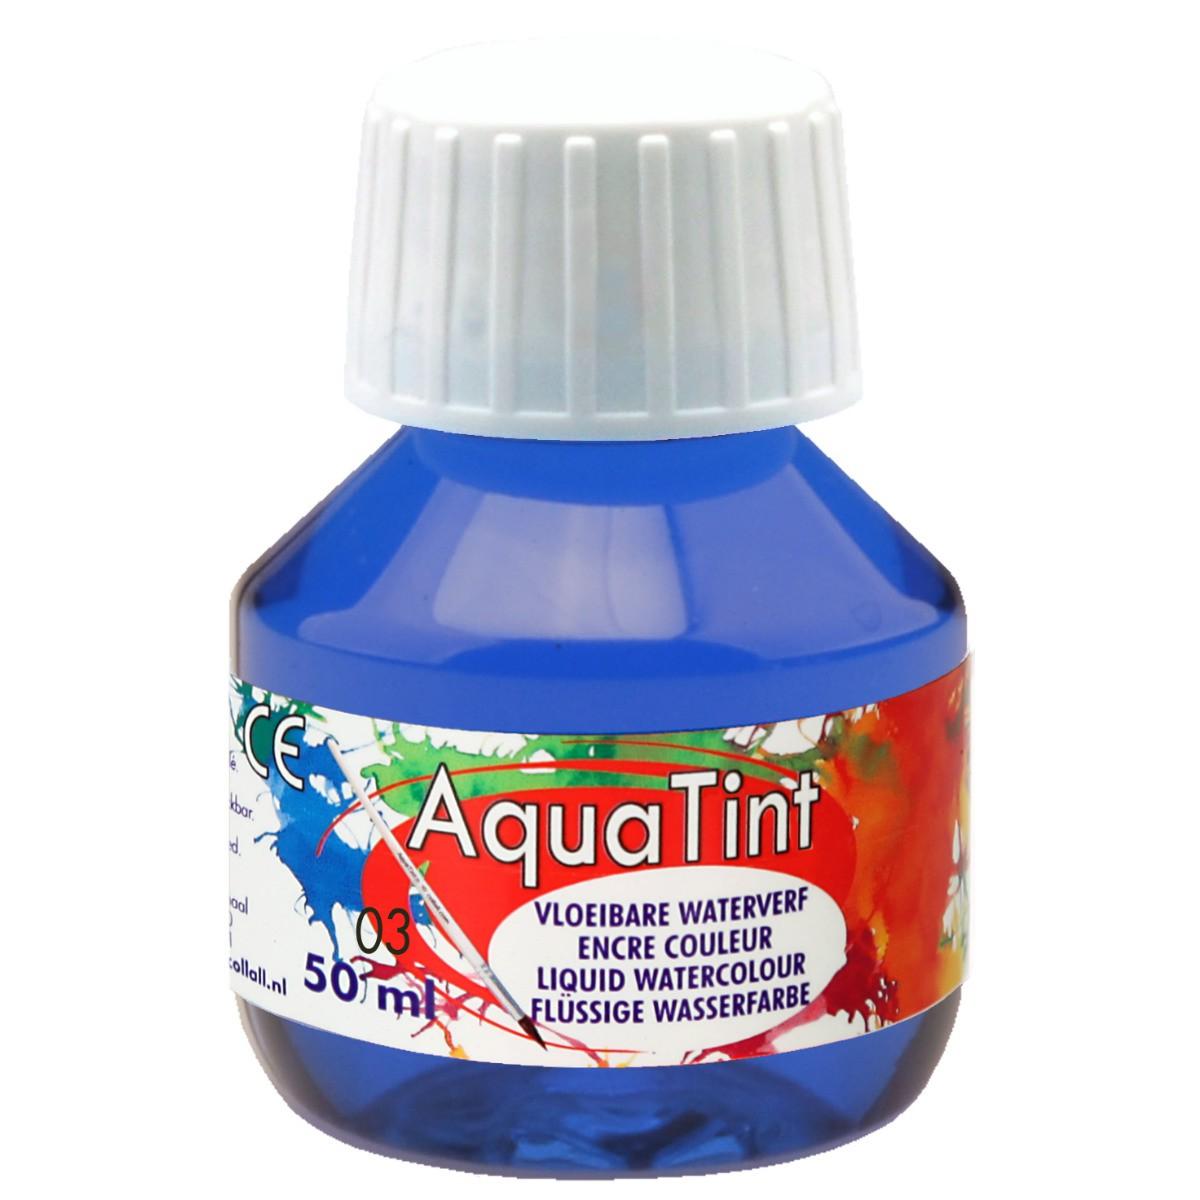 Flüssige Wasserfarbe AquaTint - dunkelblau, 50ml Flasche